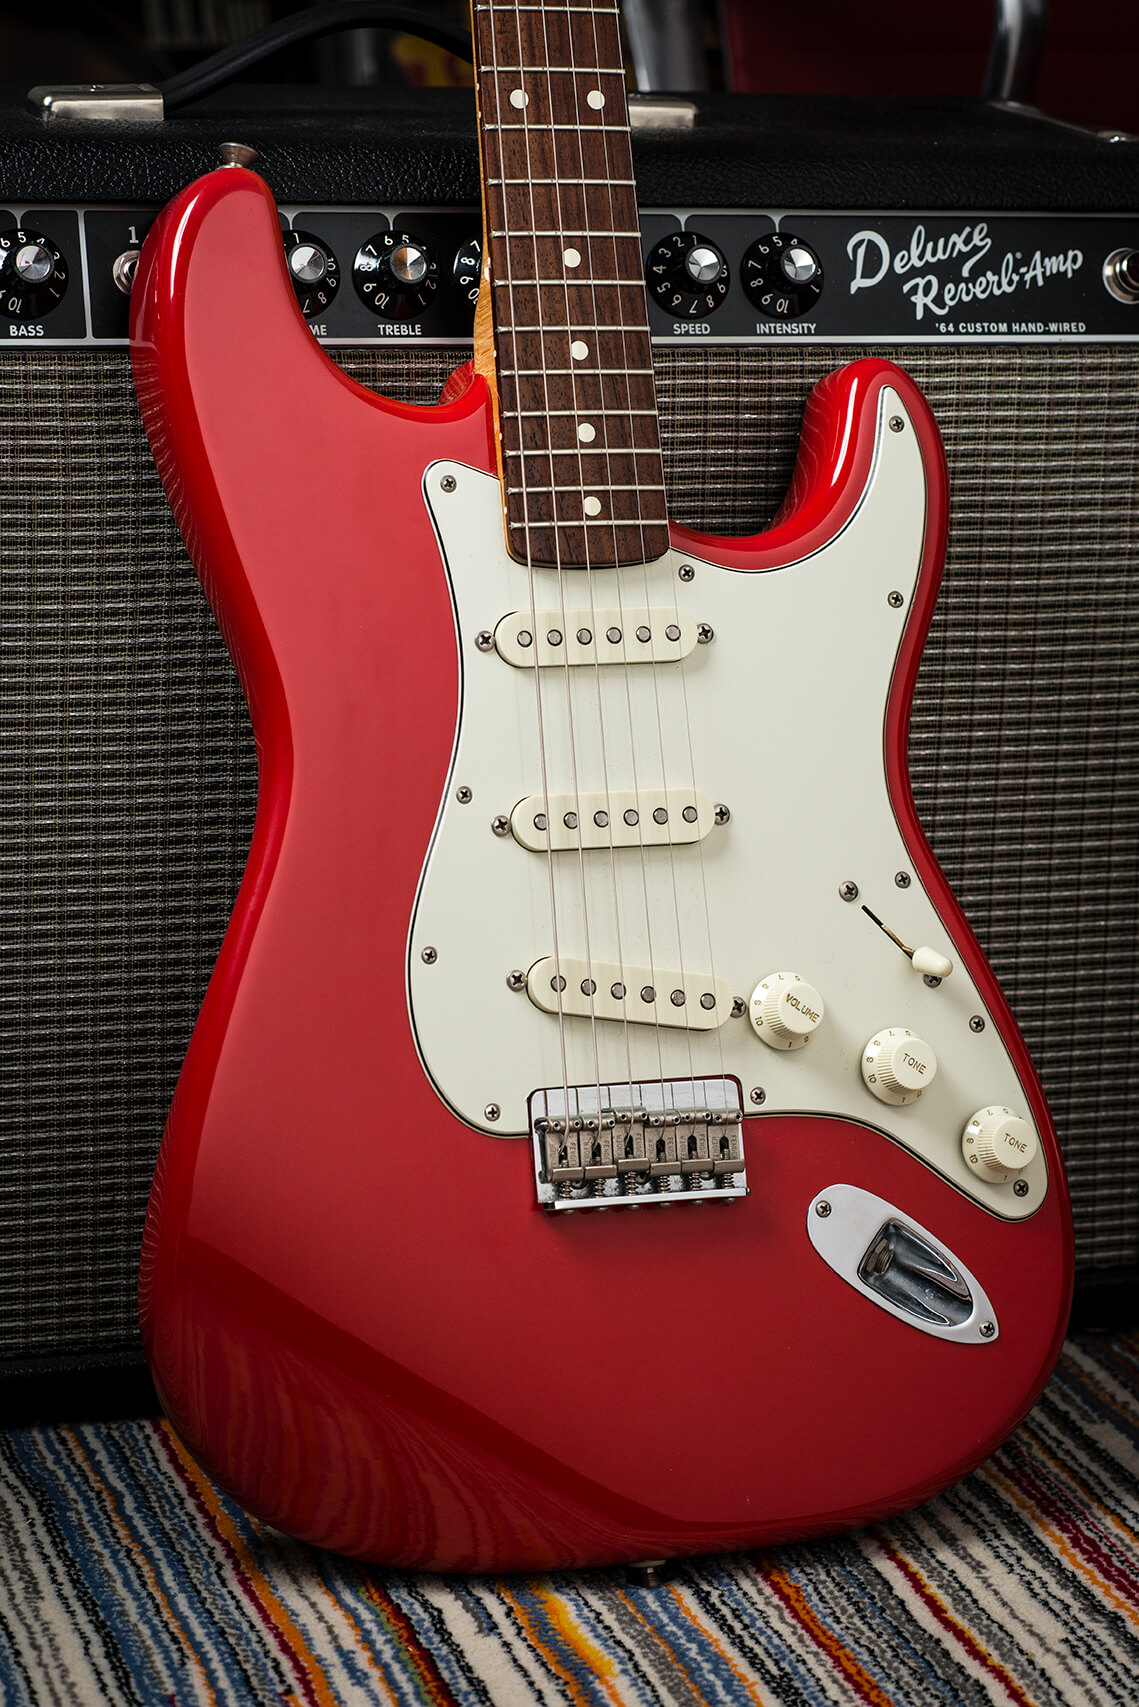 Jeff Garlin's Fender Custom Shop Robert Cray Fiesta Red Stratocaster Body